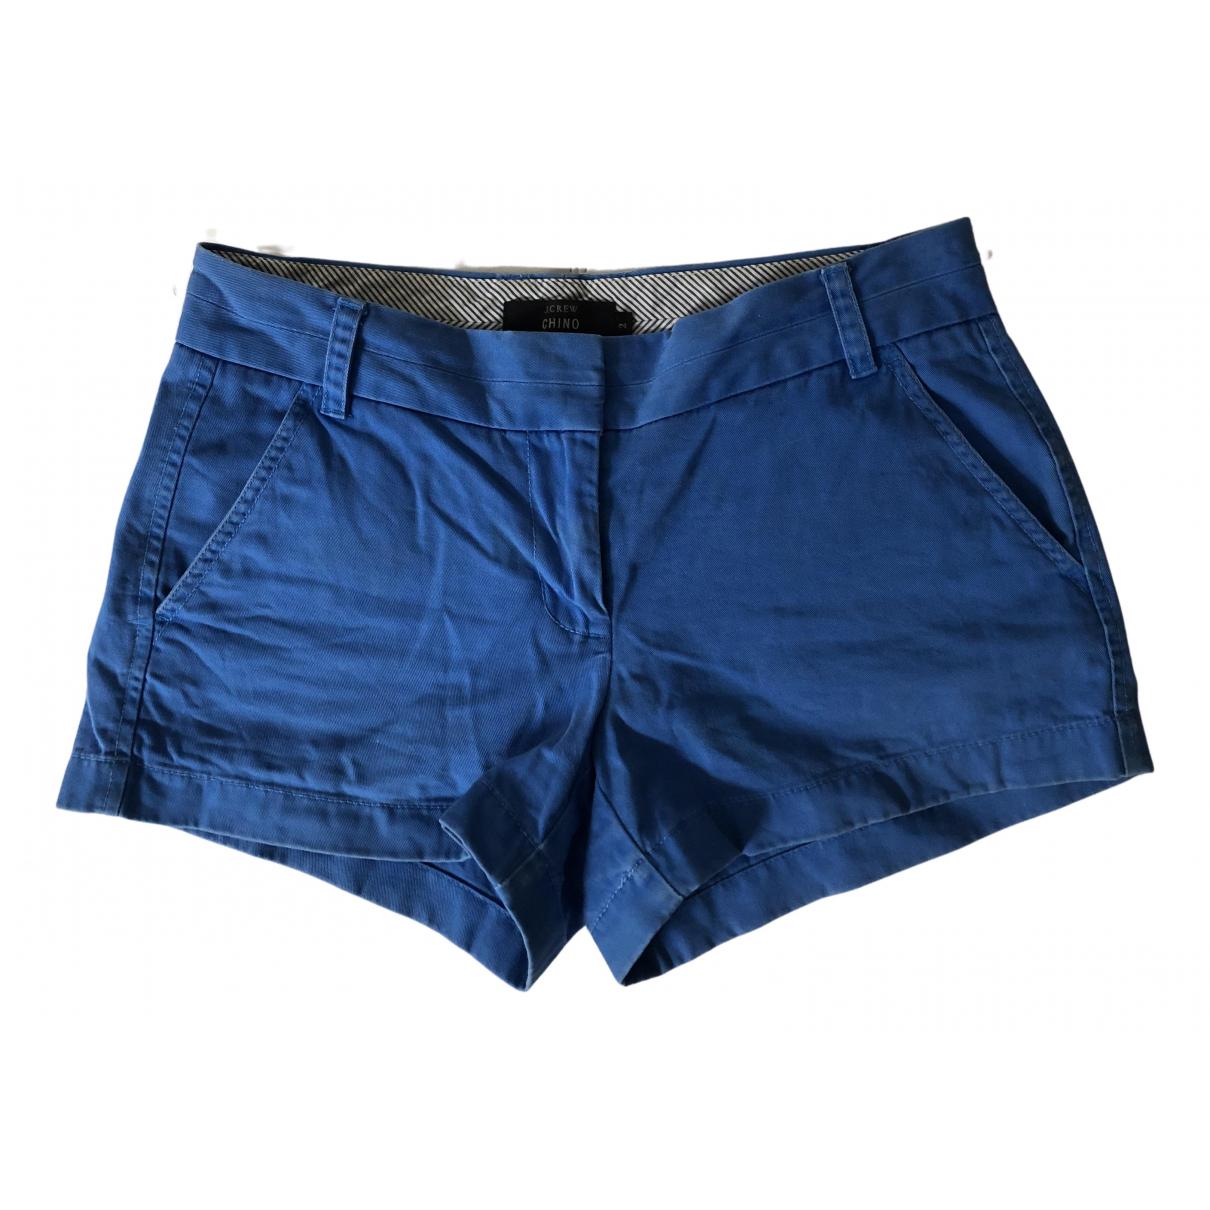 J.crew \N Shorts in  Blau Baumwolle